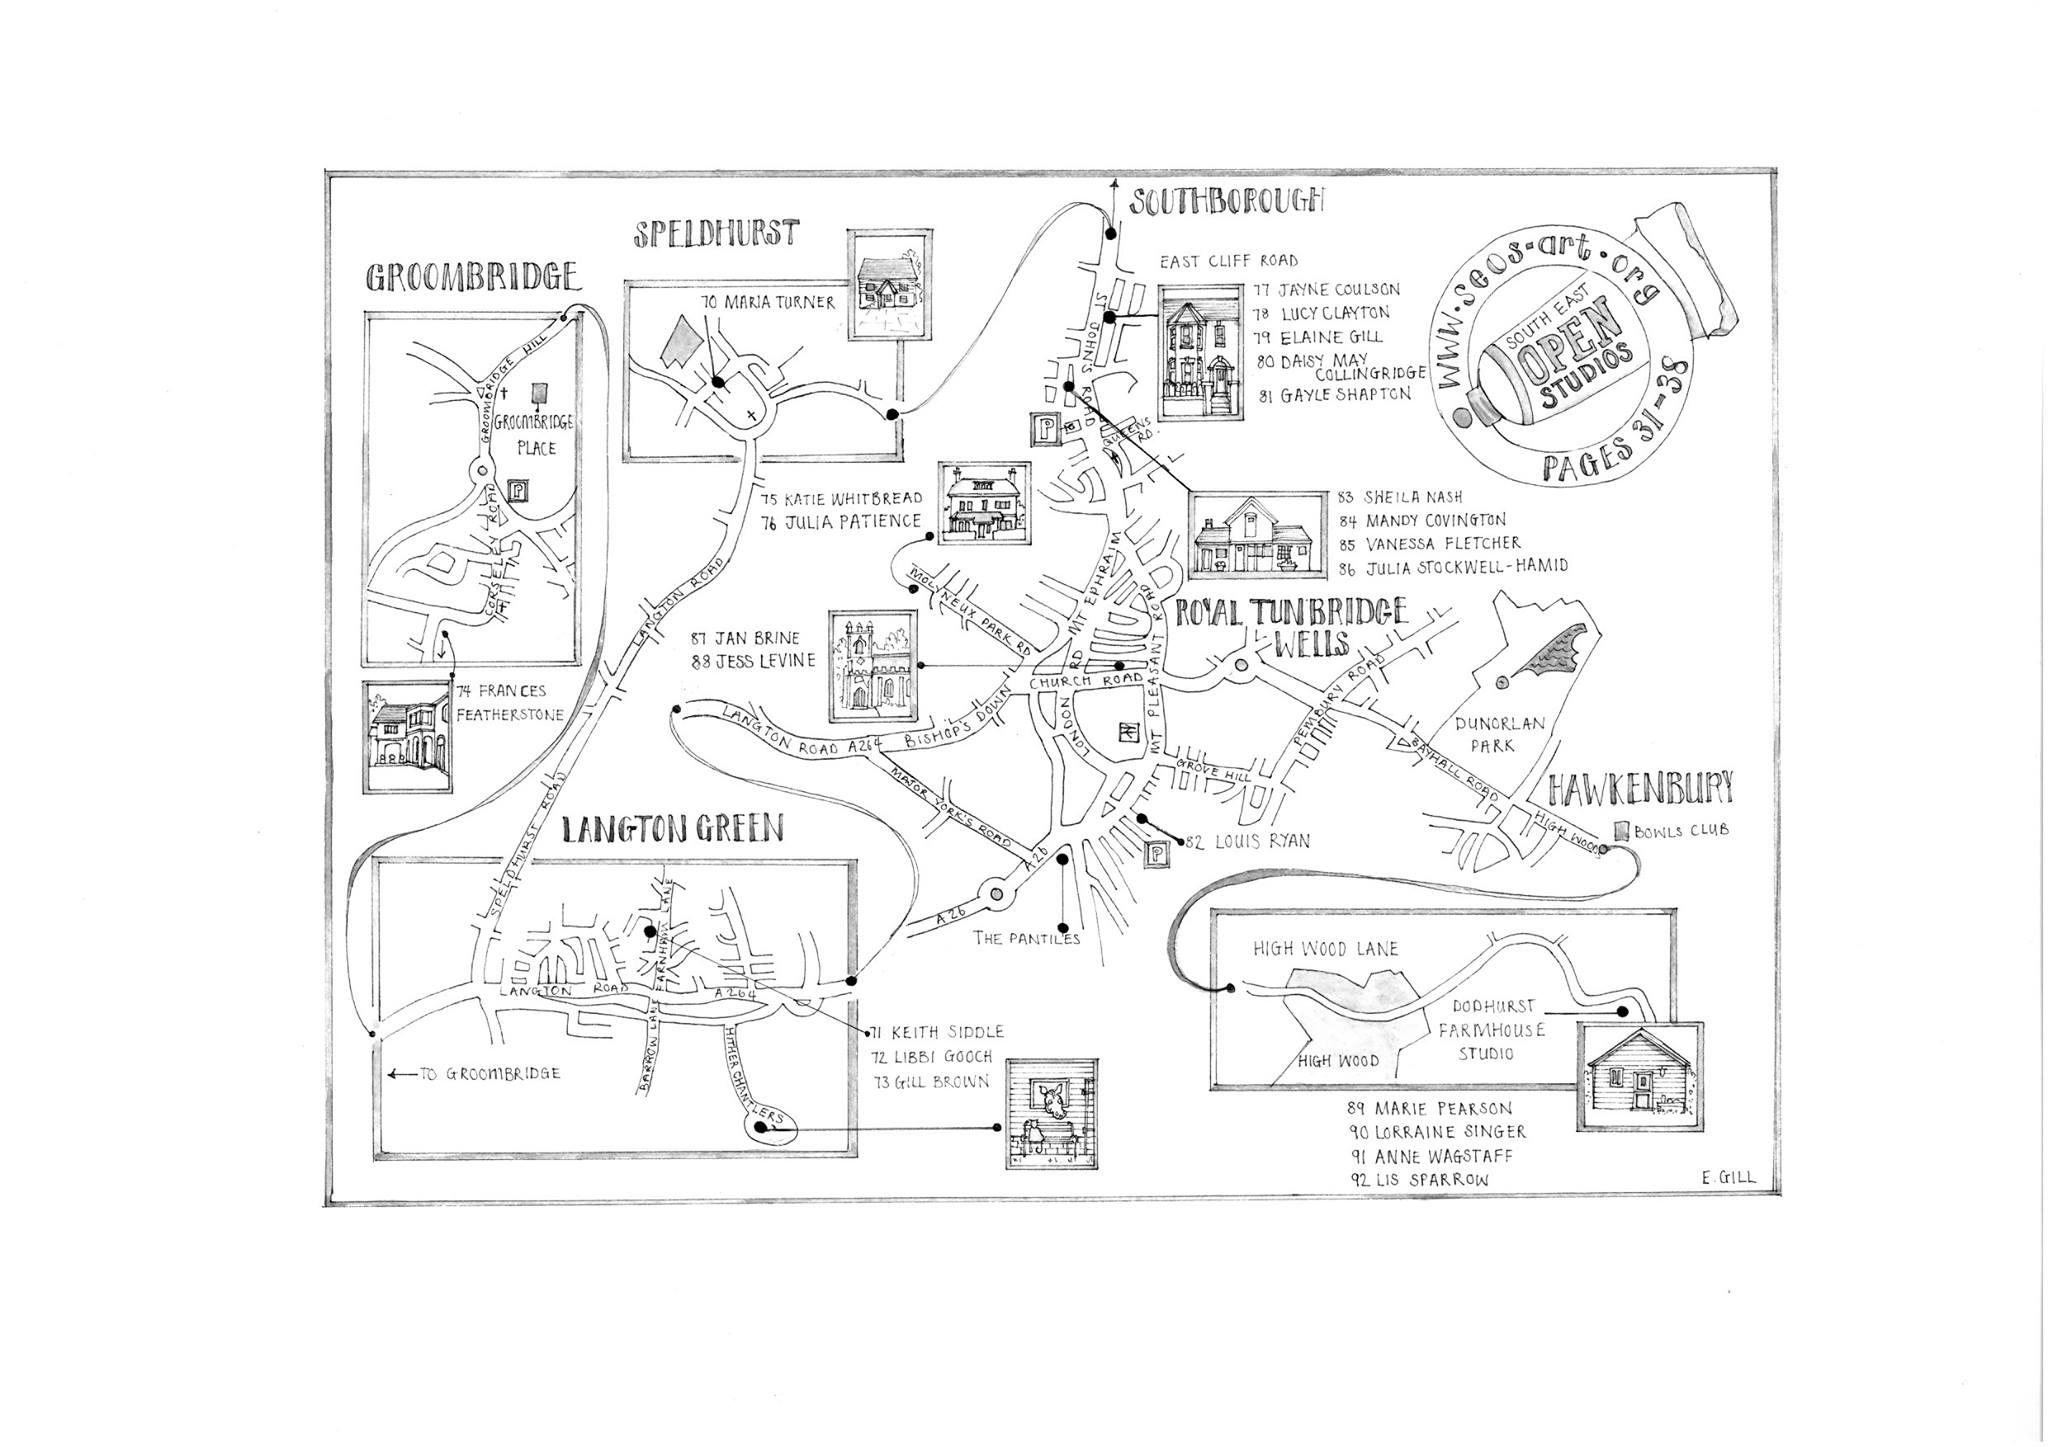 South East Open Studio Tunbridge Wells Trail Map designed by Elaine Gill